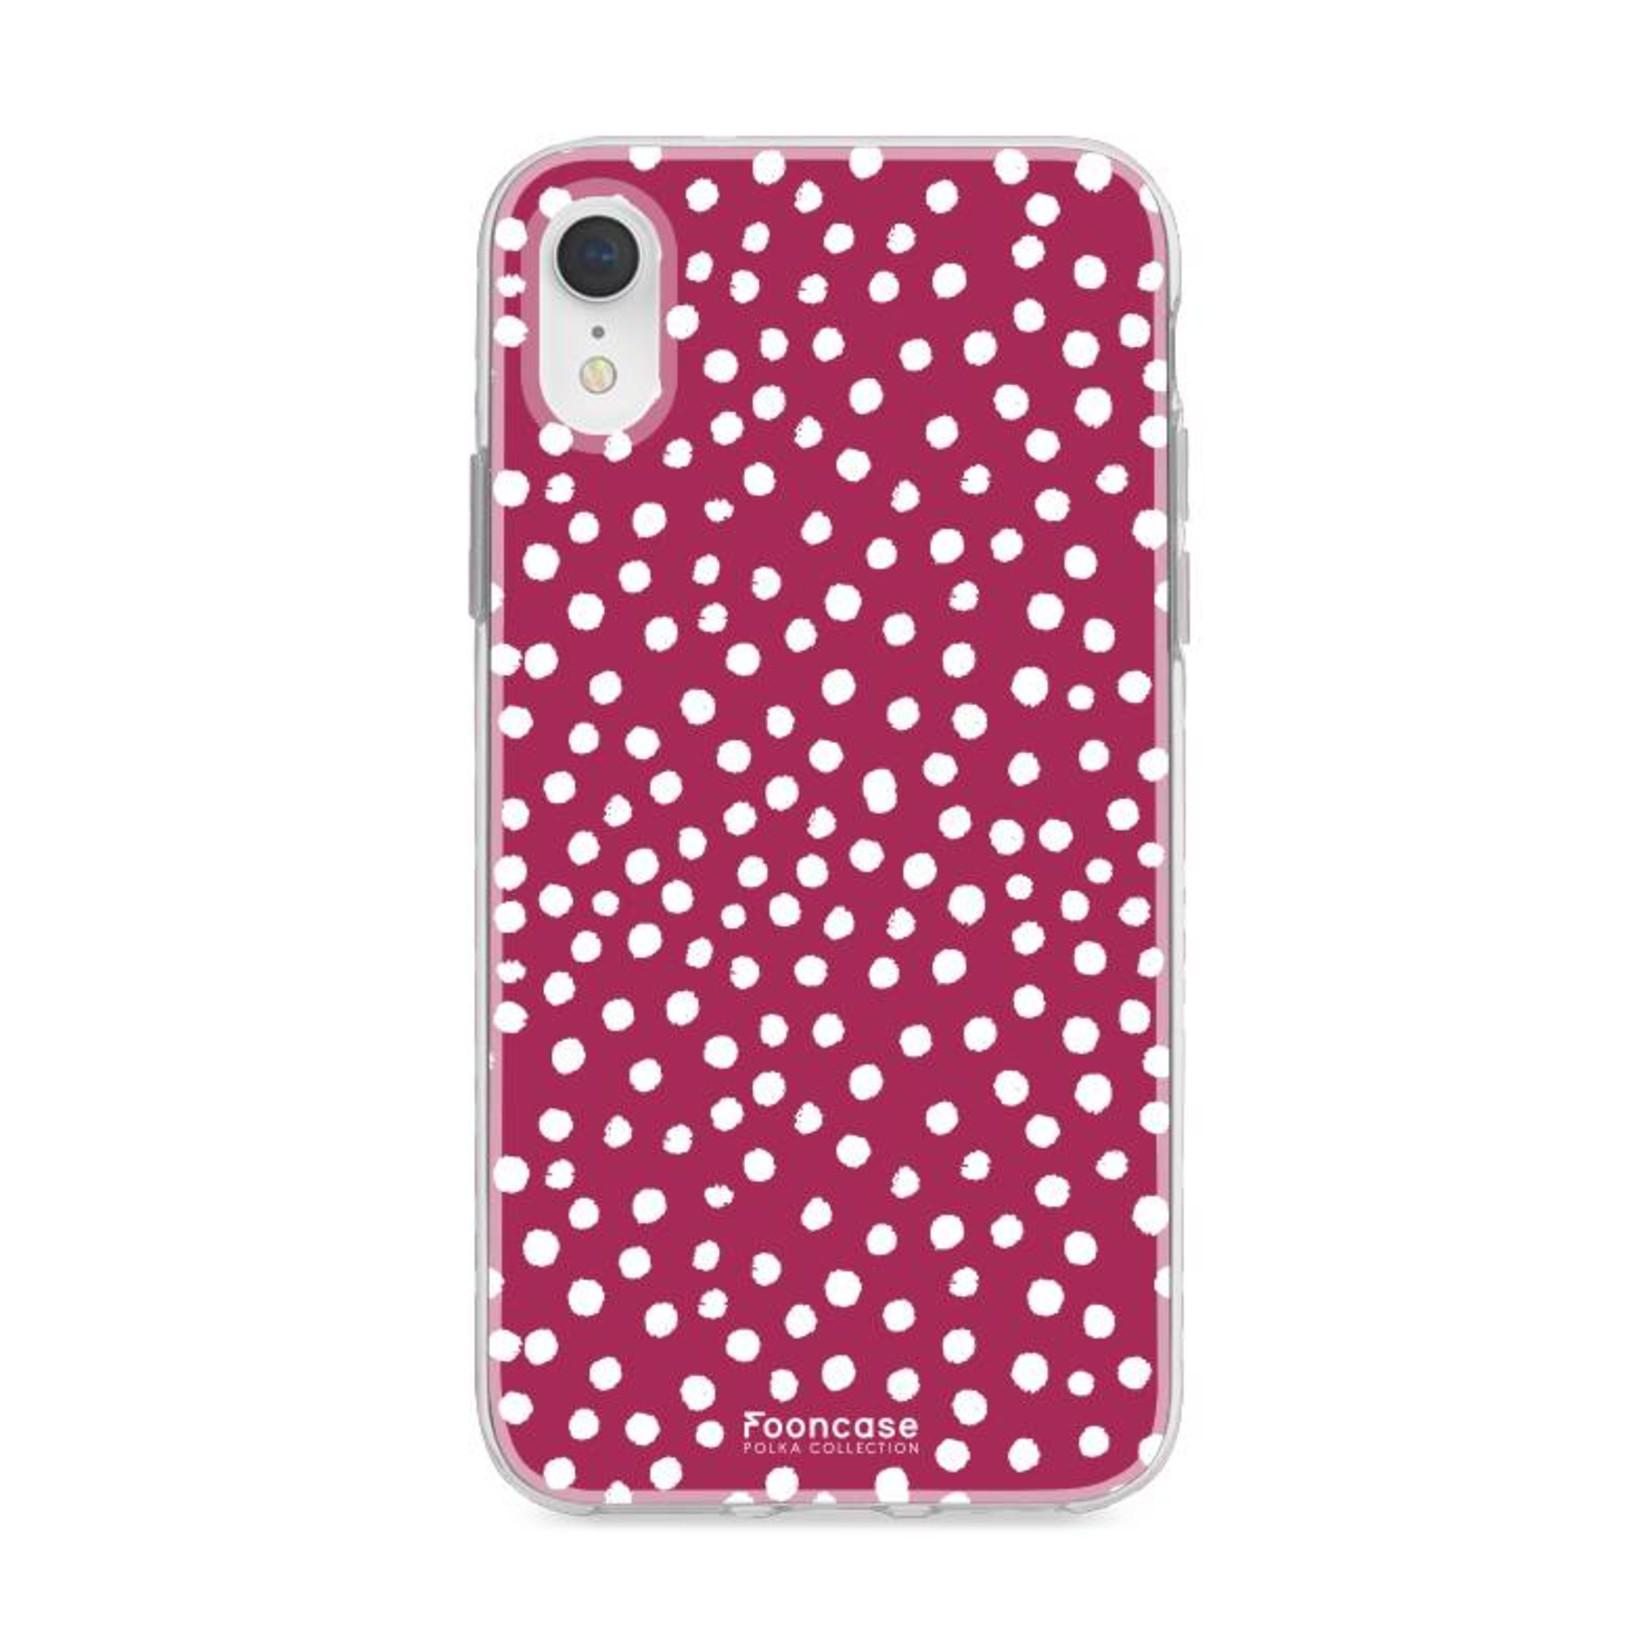 FOONCASE iPhone XR hoesje TPU Soft Case - Back Cover - POLKA COLLECTION / Stipjes / Stippen / Bordeaux Rood